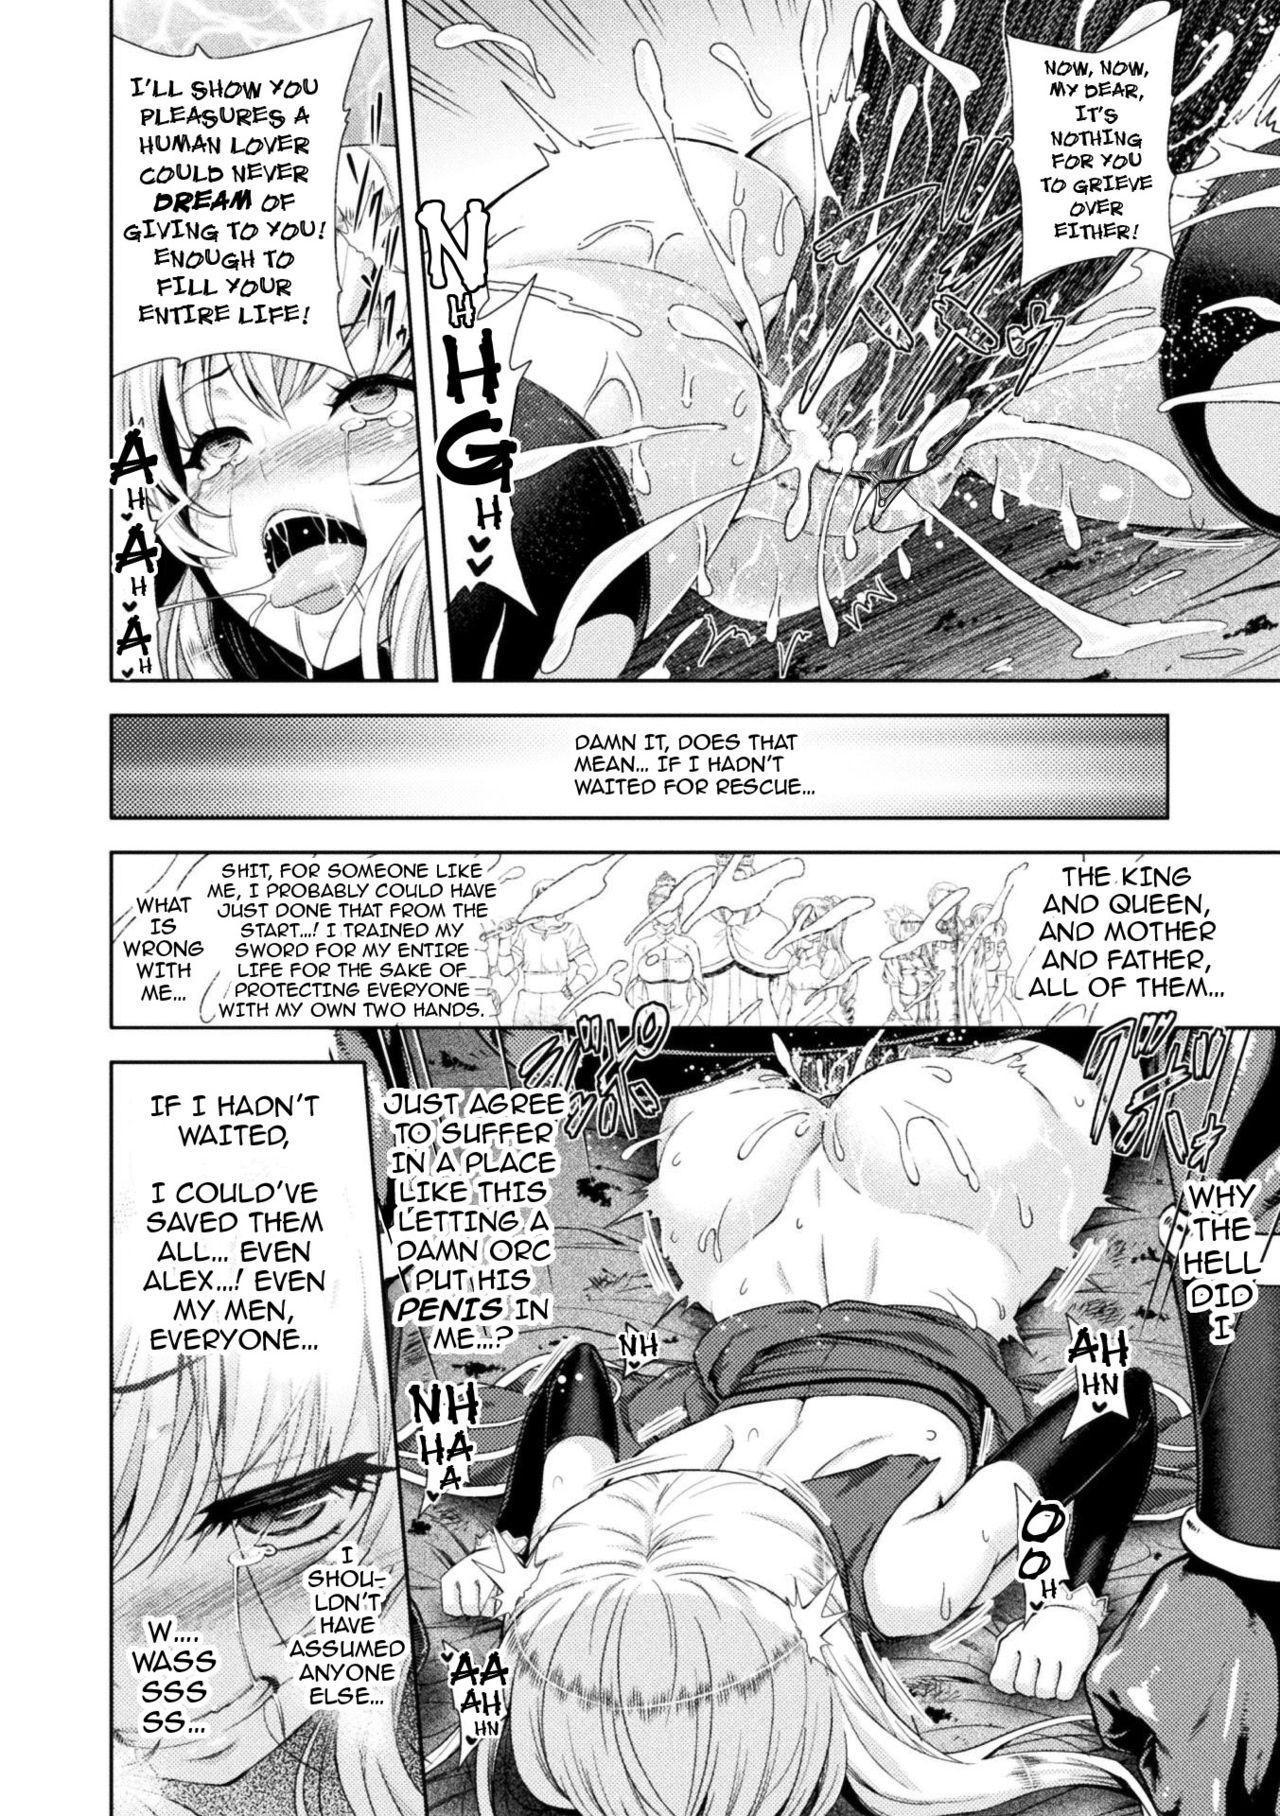 [Yamada Gogogo] Erona ~Orc no Inmon ni Okasareta Onna Kishi no Matsuro~ | Erona ~The Fall of a Beautiful Knight Cursed with the Lewd Mark of an Orc~ Ch. 1-6 [English] [darknight] [Decensored] [ongoing] 39